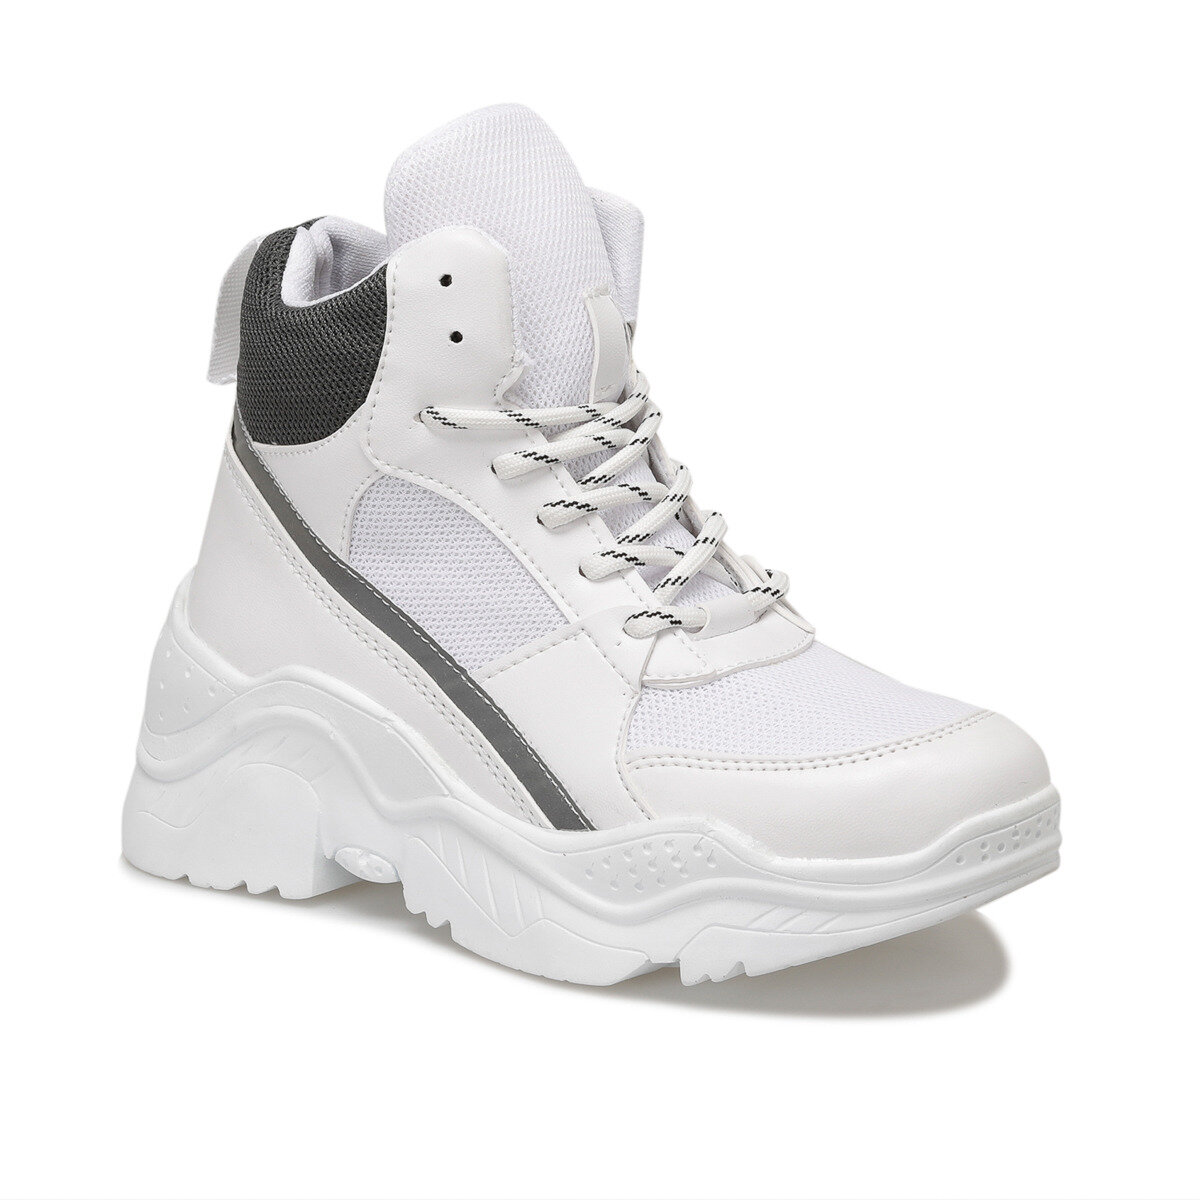 FLO 19K-959 White Women 'S Sneaker BUTIGO